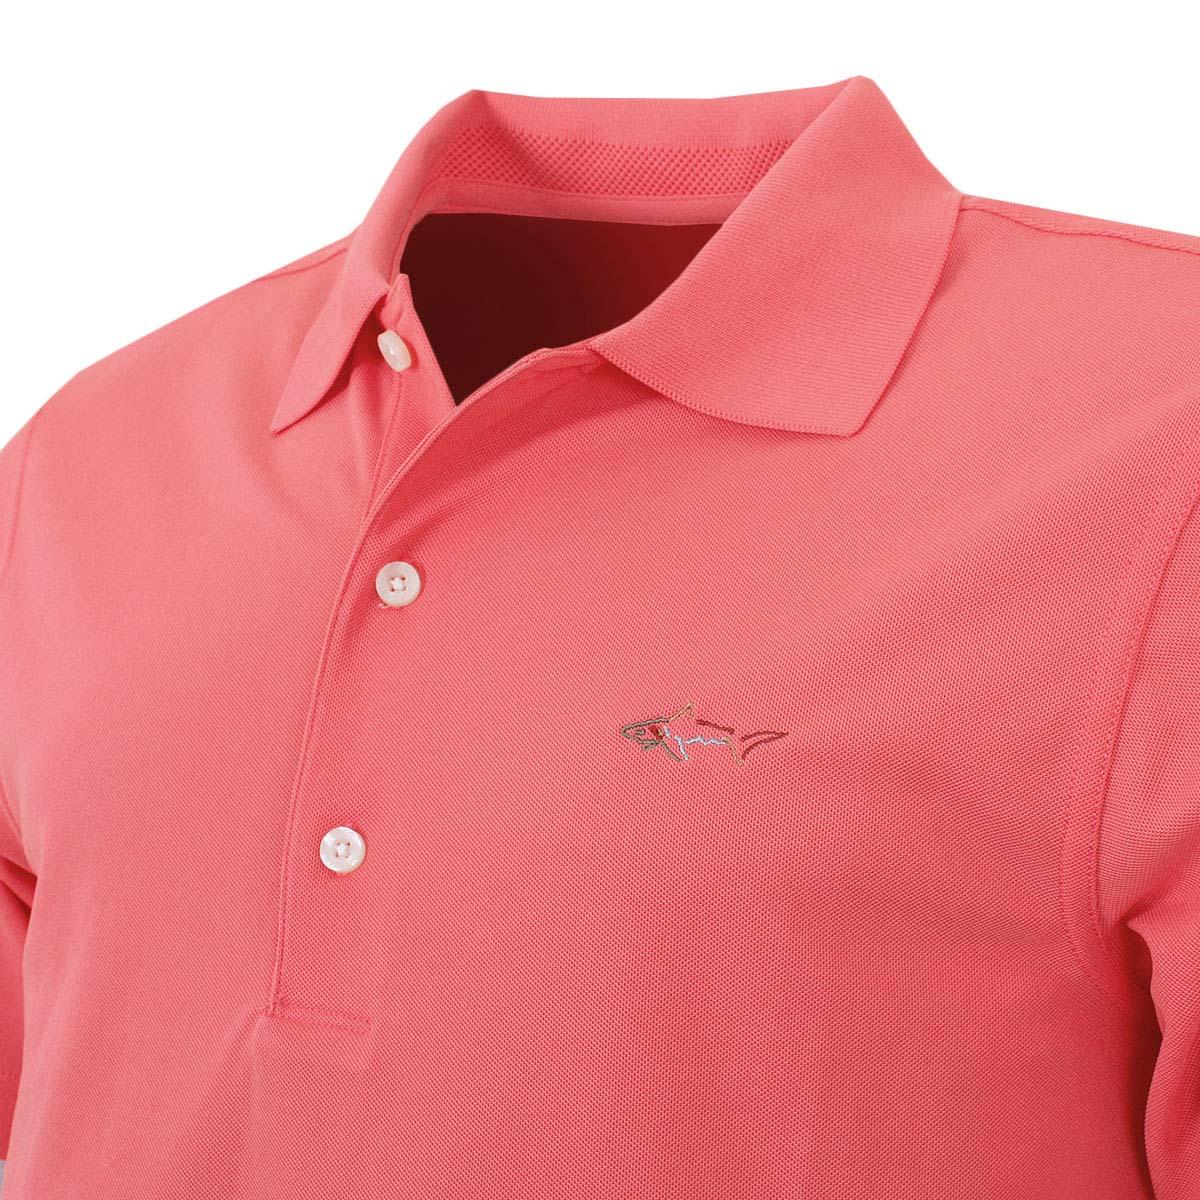 Greg-Norman-Mens-KX04-Performance-Micro-Pique-Golf-Polo-Shirt-28-OFF-RRP thumbnail 17